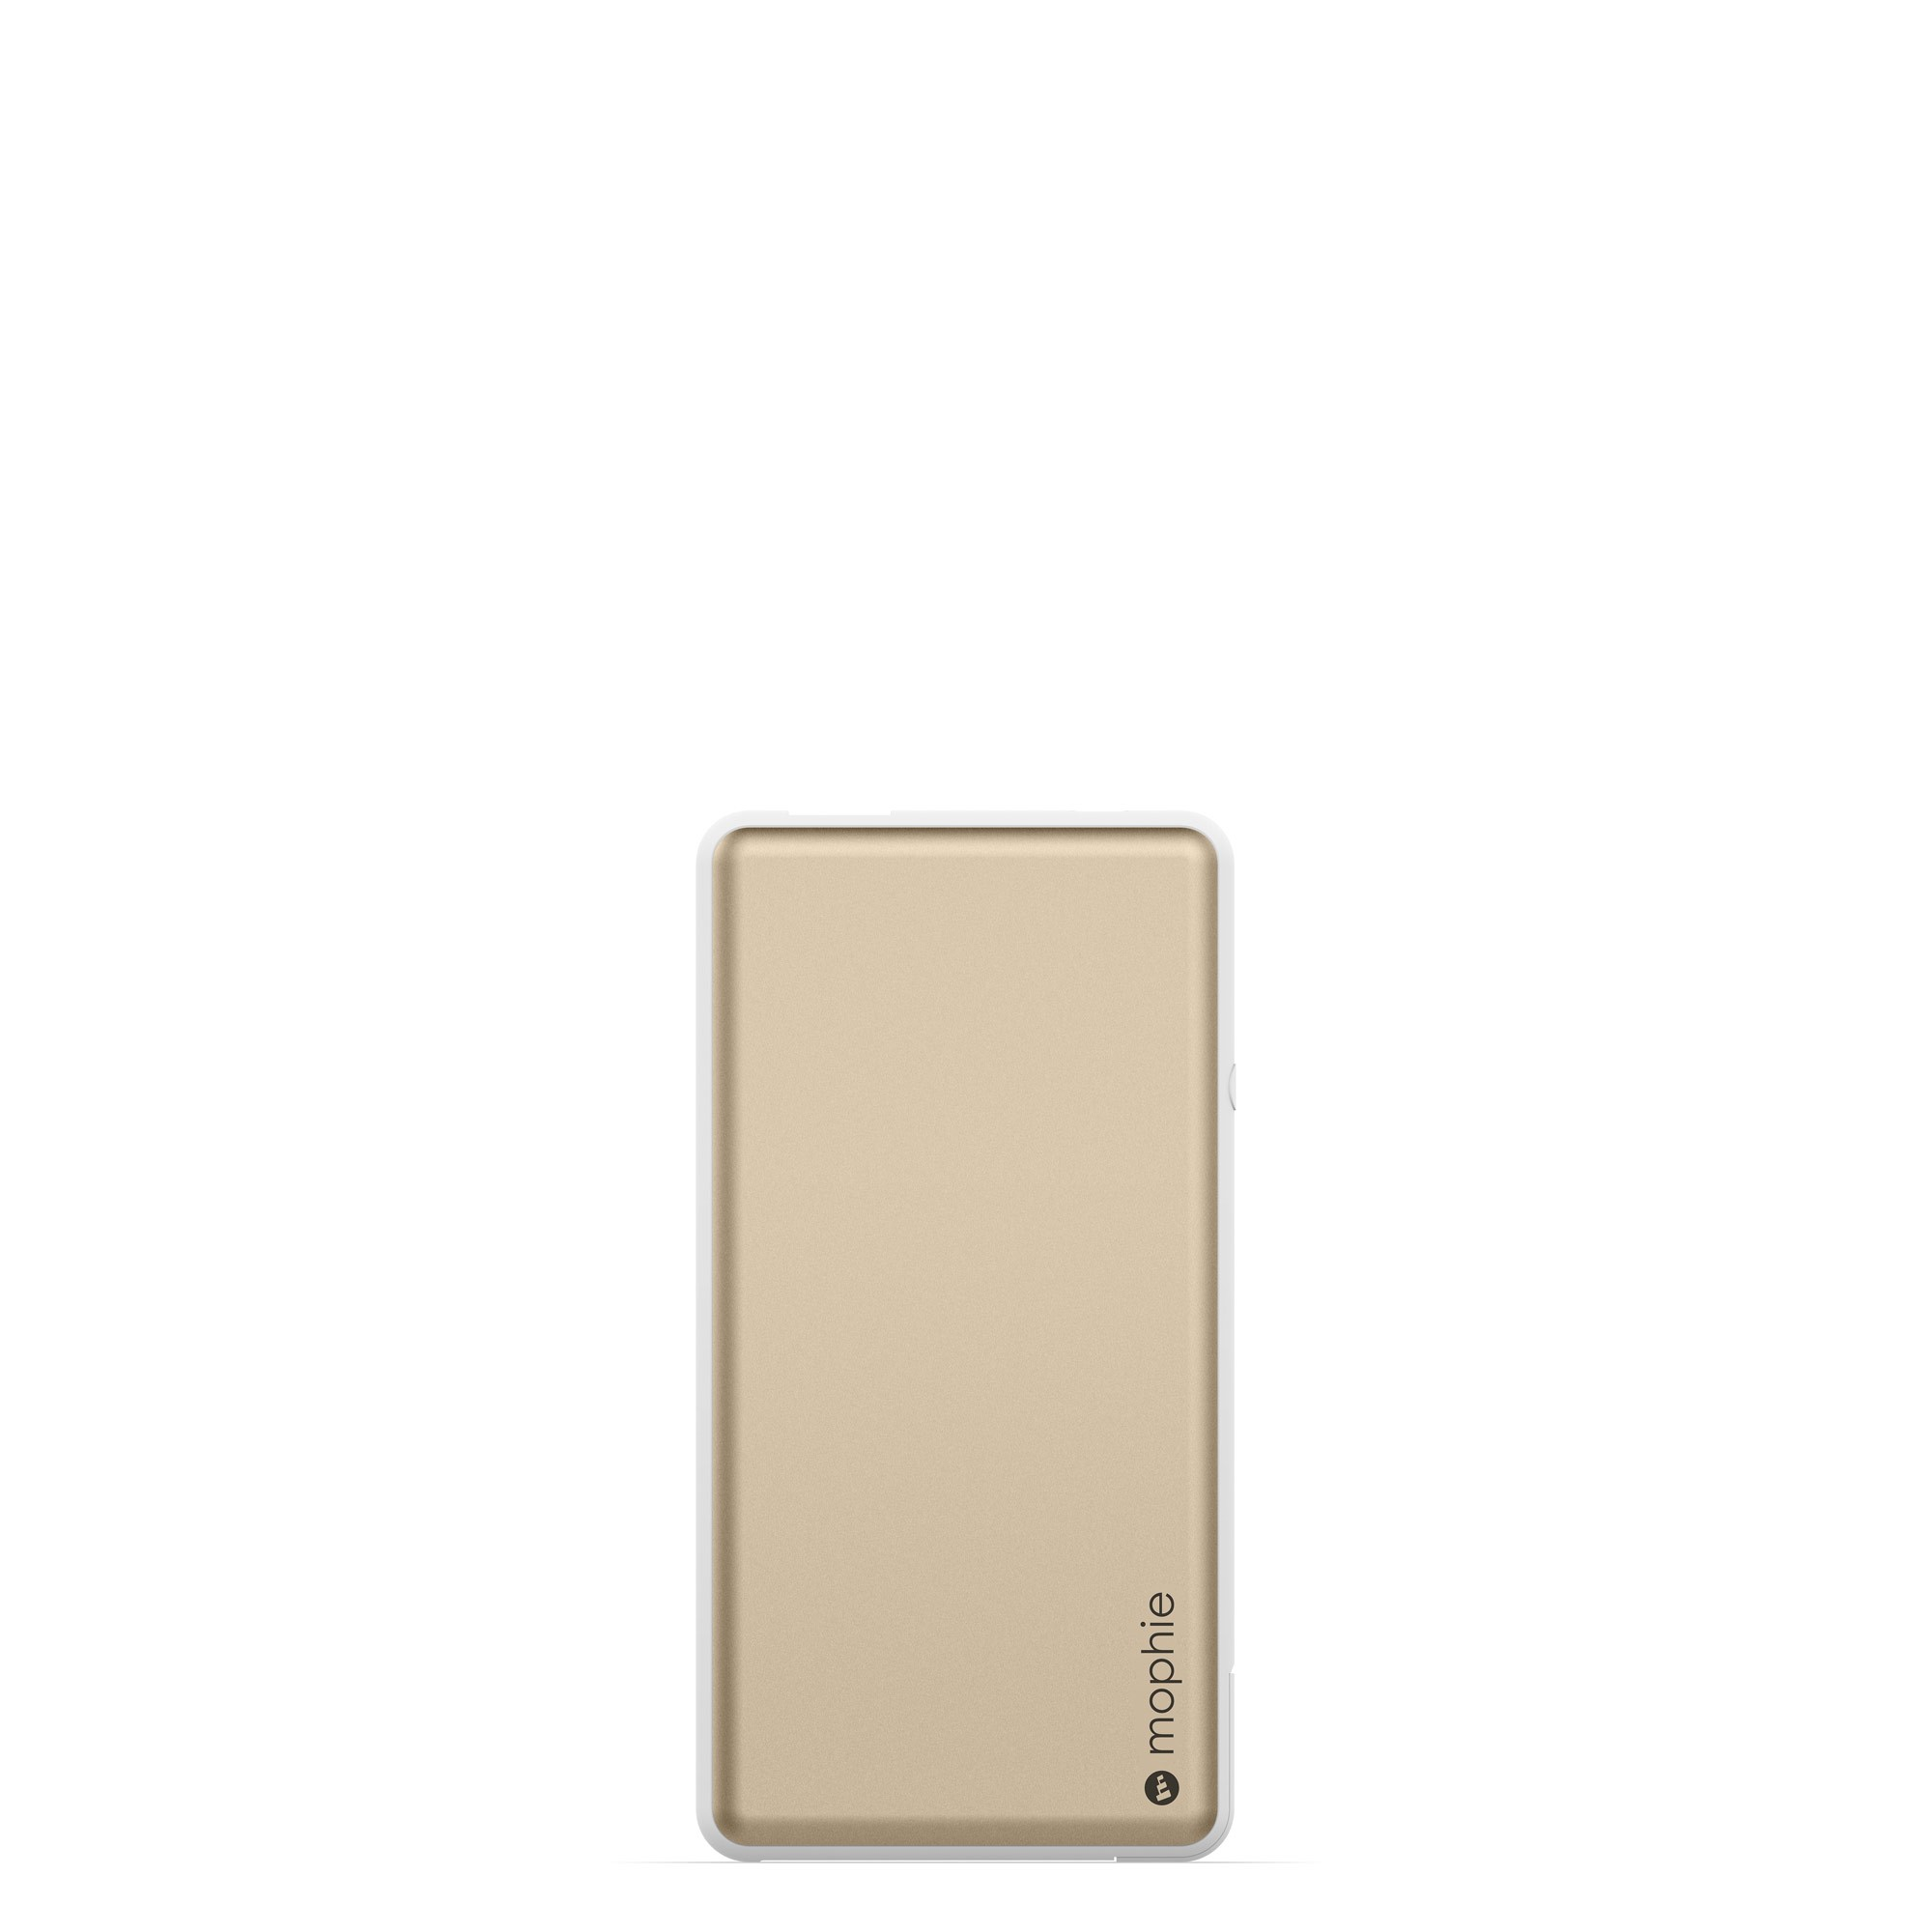 Mophie Powerstation Plus 6000 mAh Gold